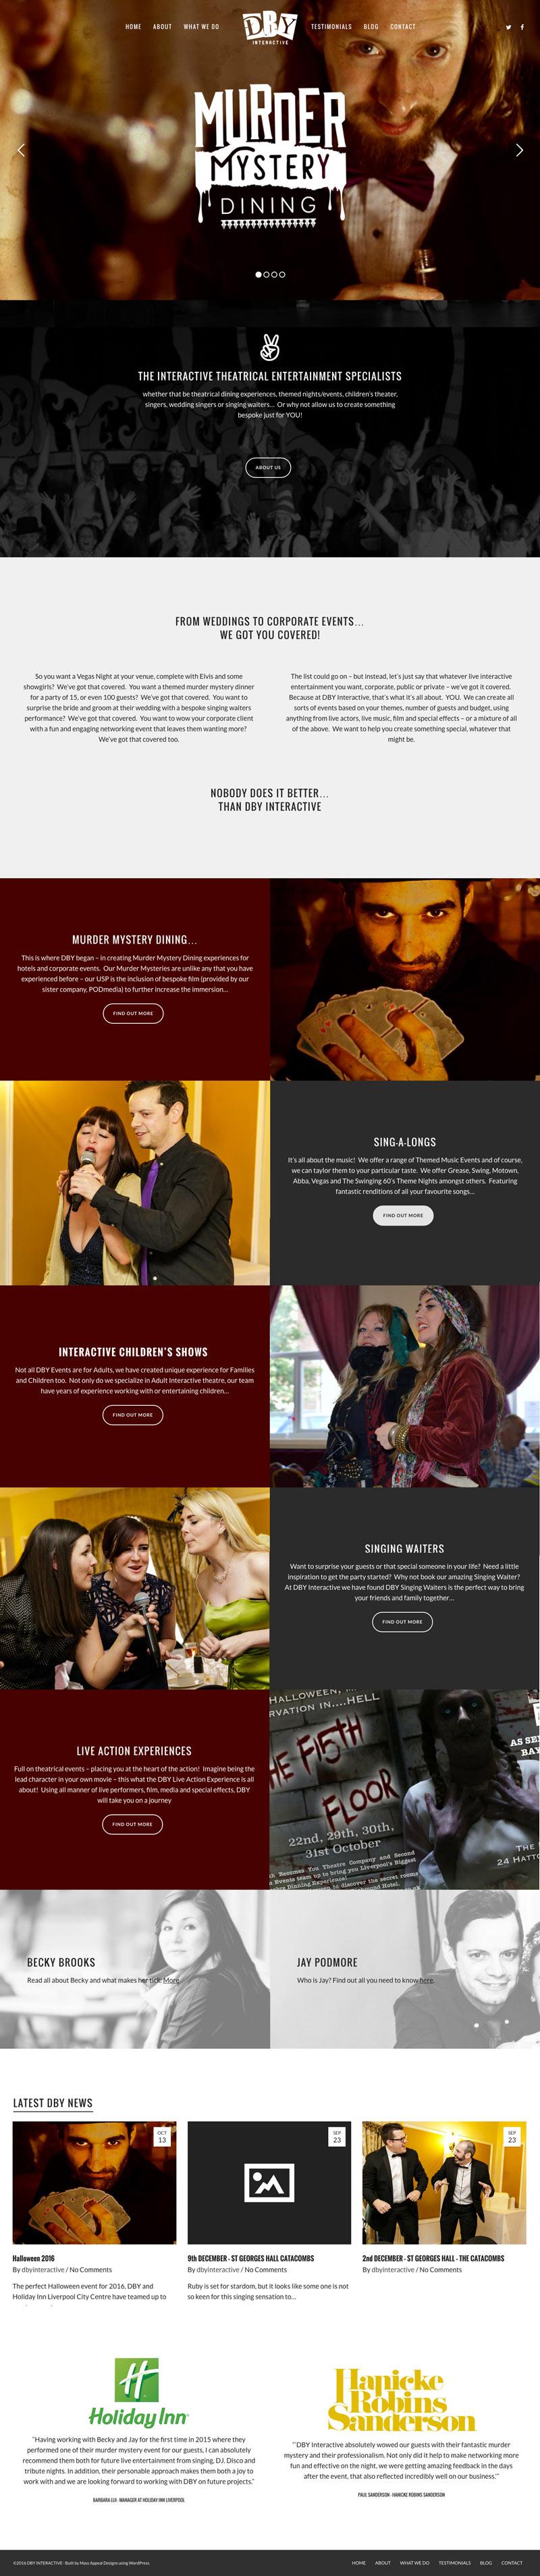 Web Design Liverpool DBY Interactive